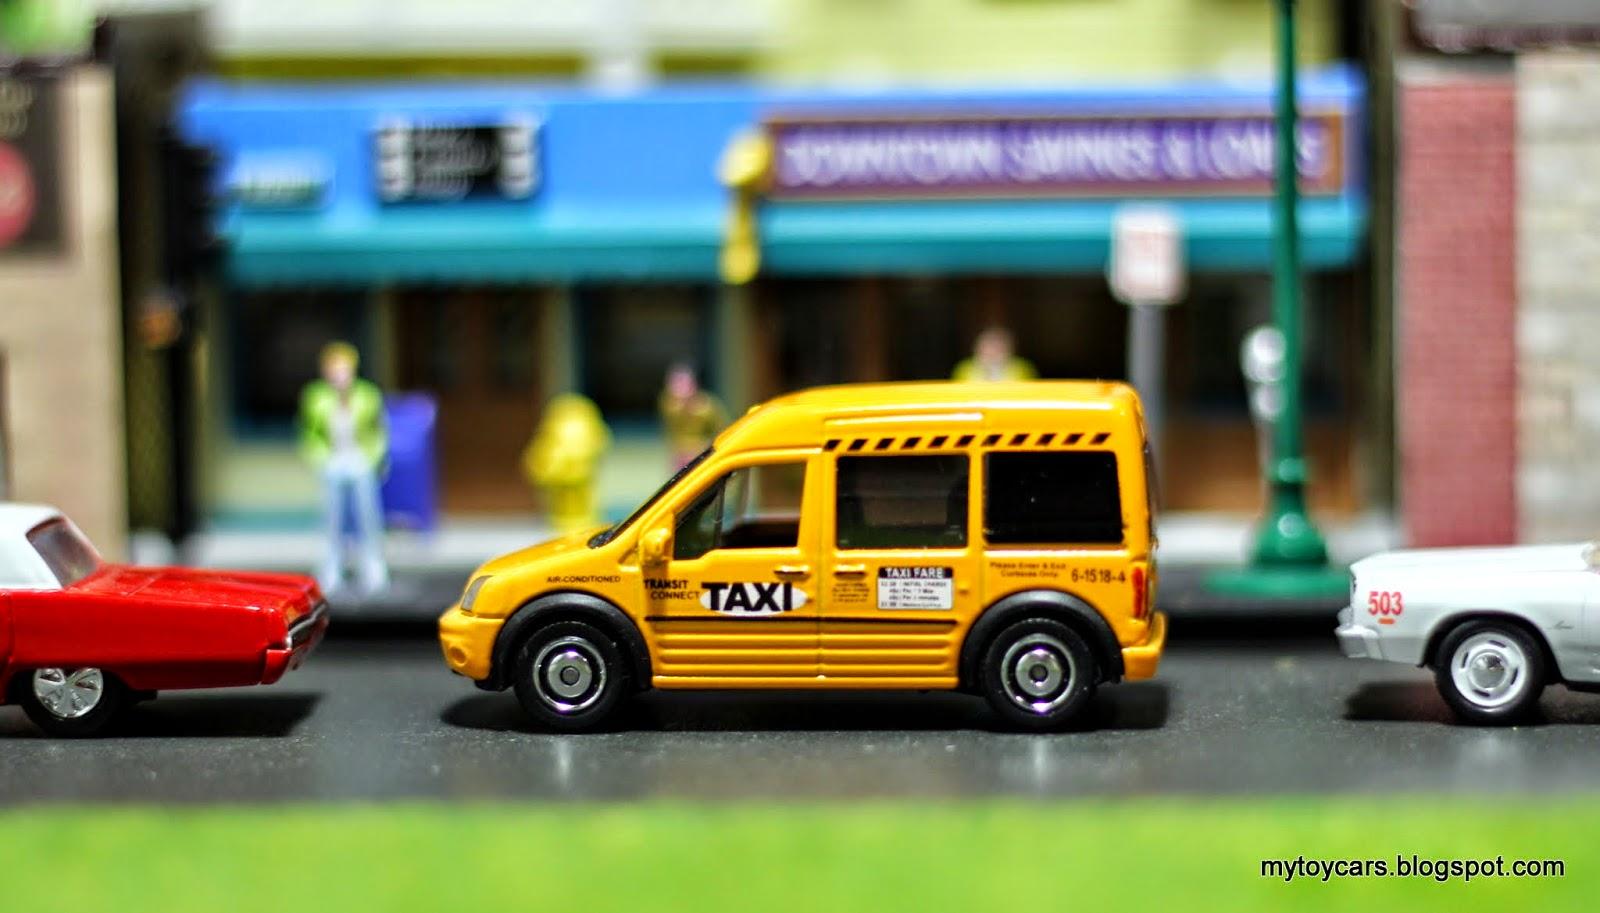 Mytoycars!: Matchbox and Johnny Lightning Taxis